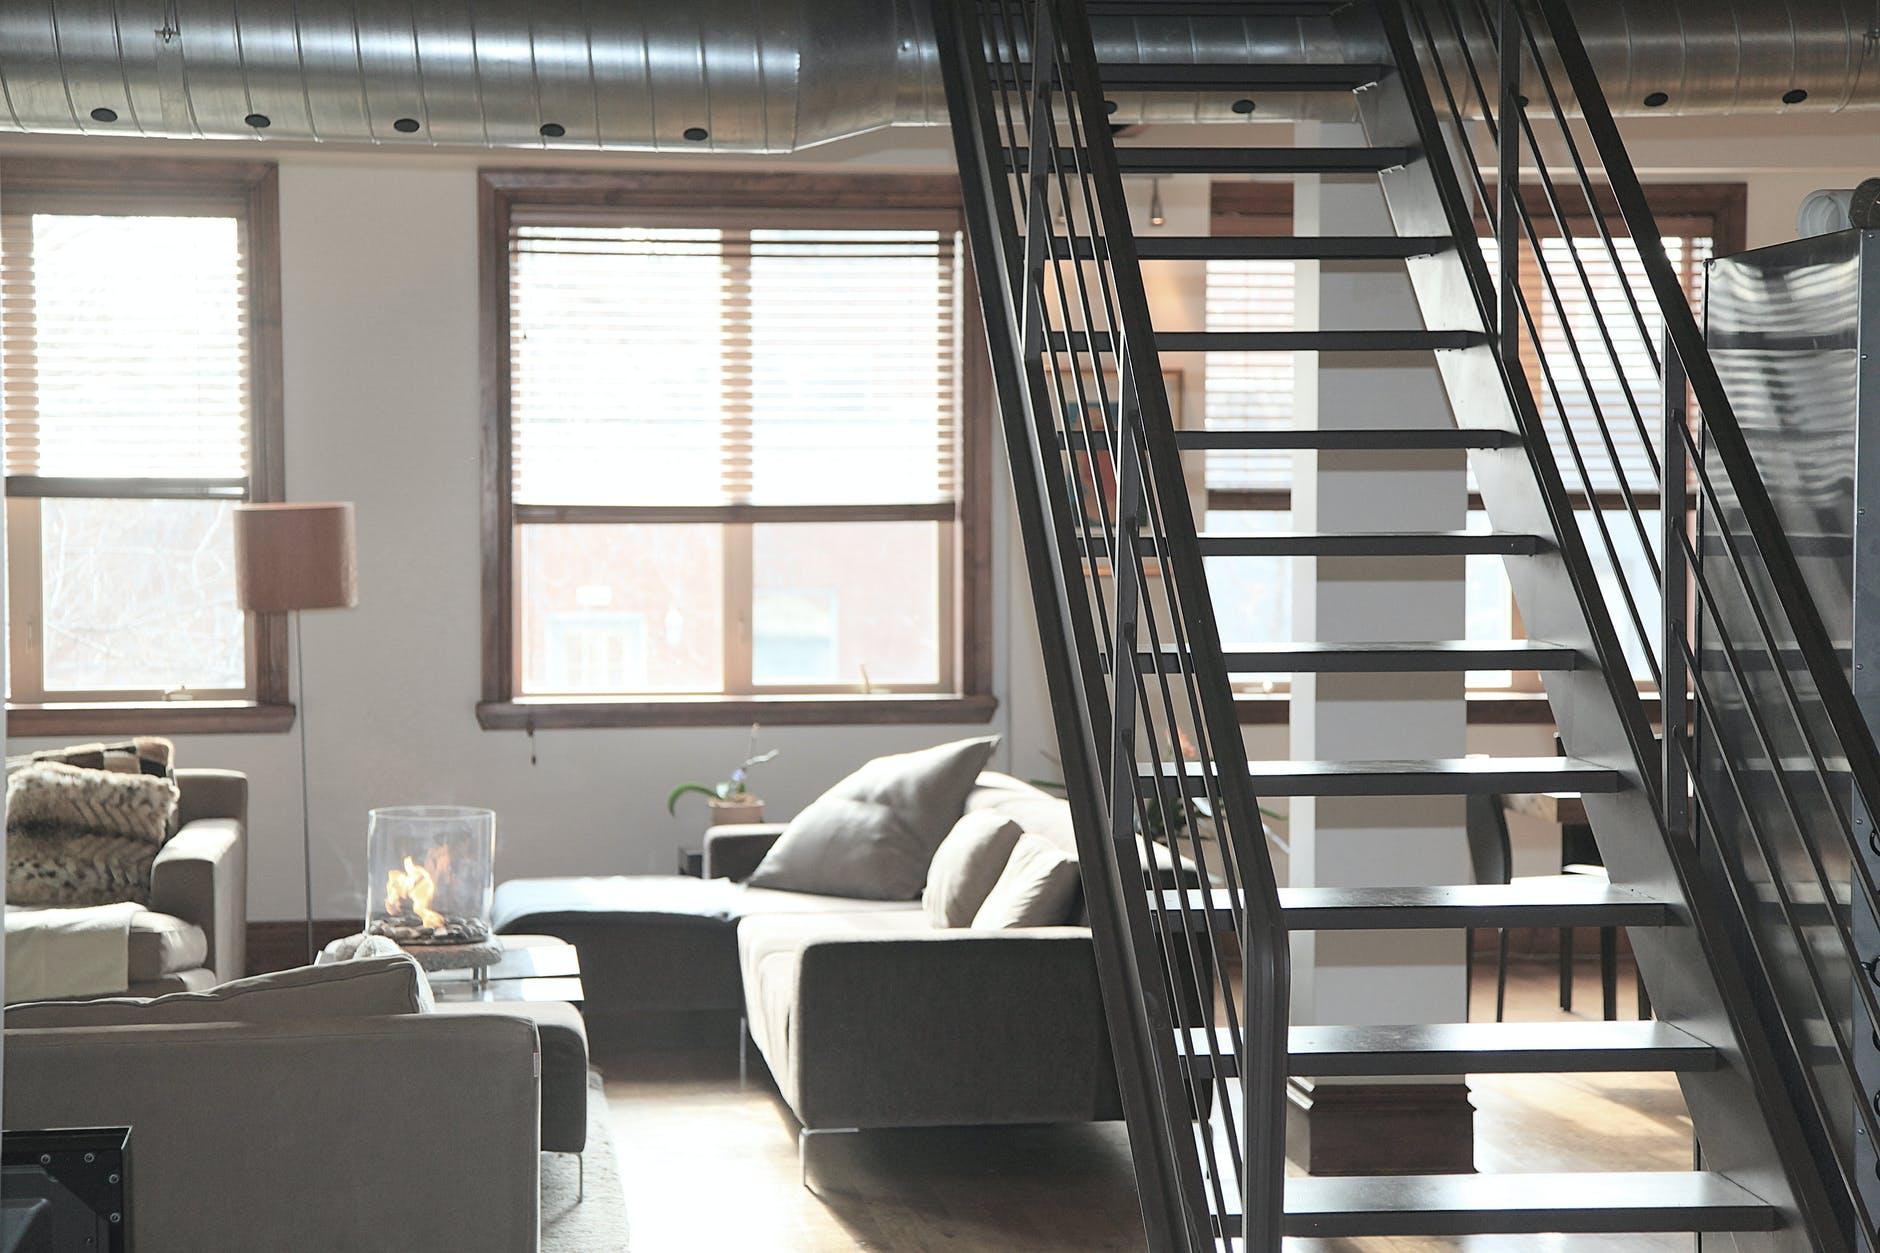 8 Factors To Consider When Choosing a Condo Vs. an Apartment